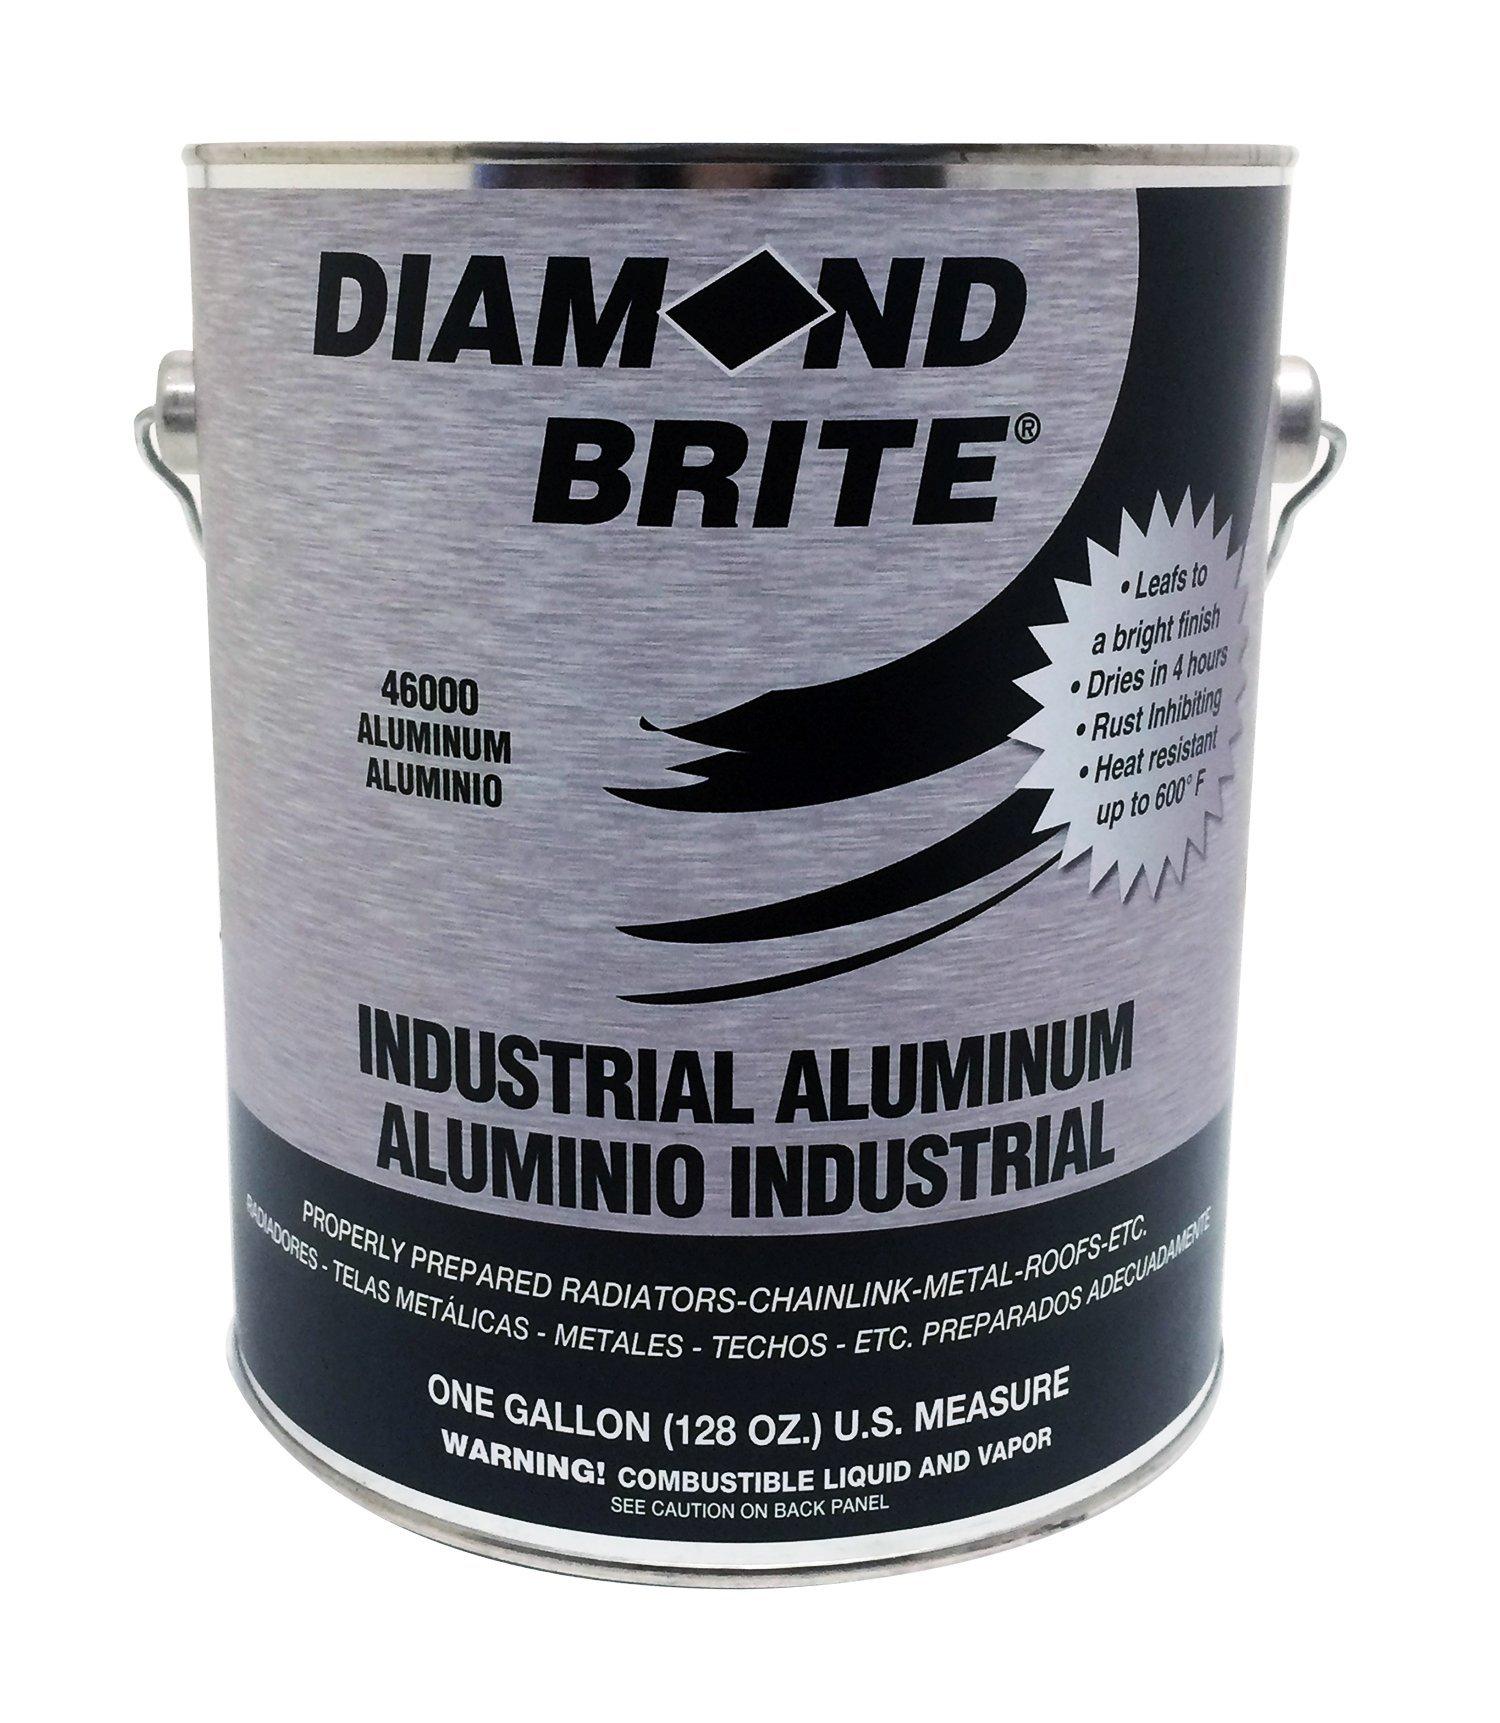 Diamond Brite Paint 46000 1-Gallon Aluminum Paint